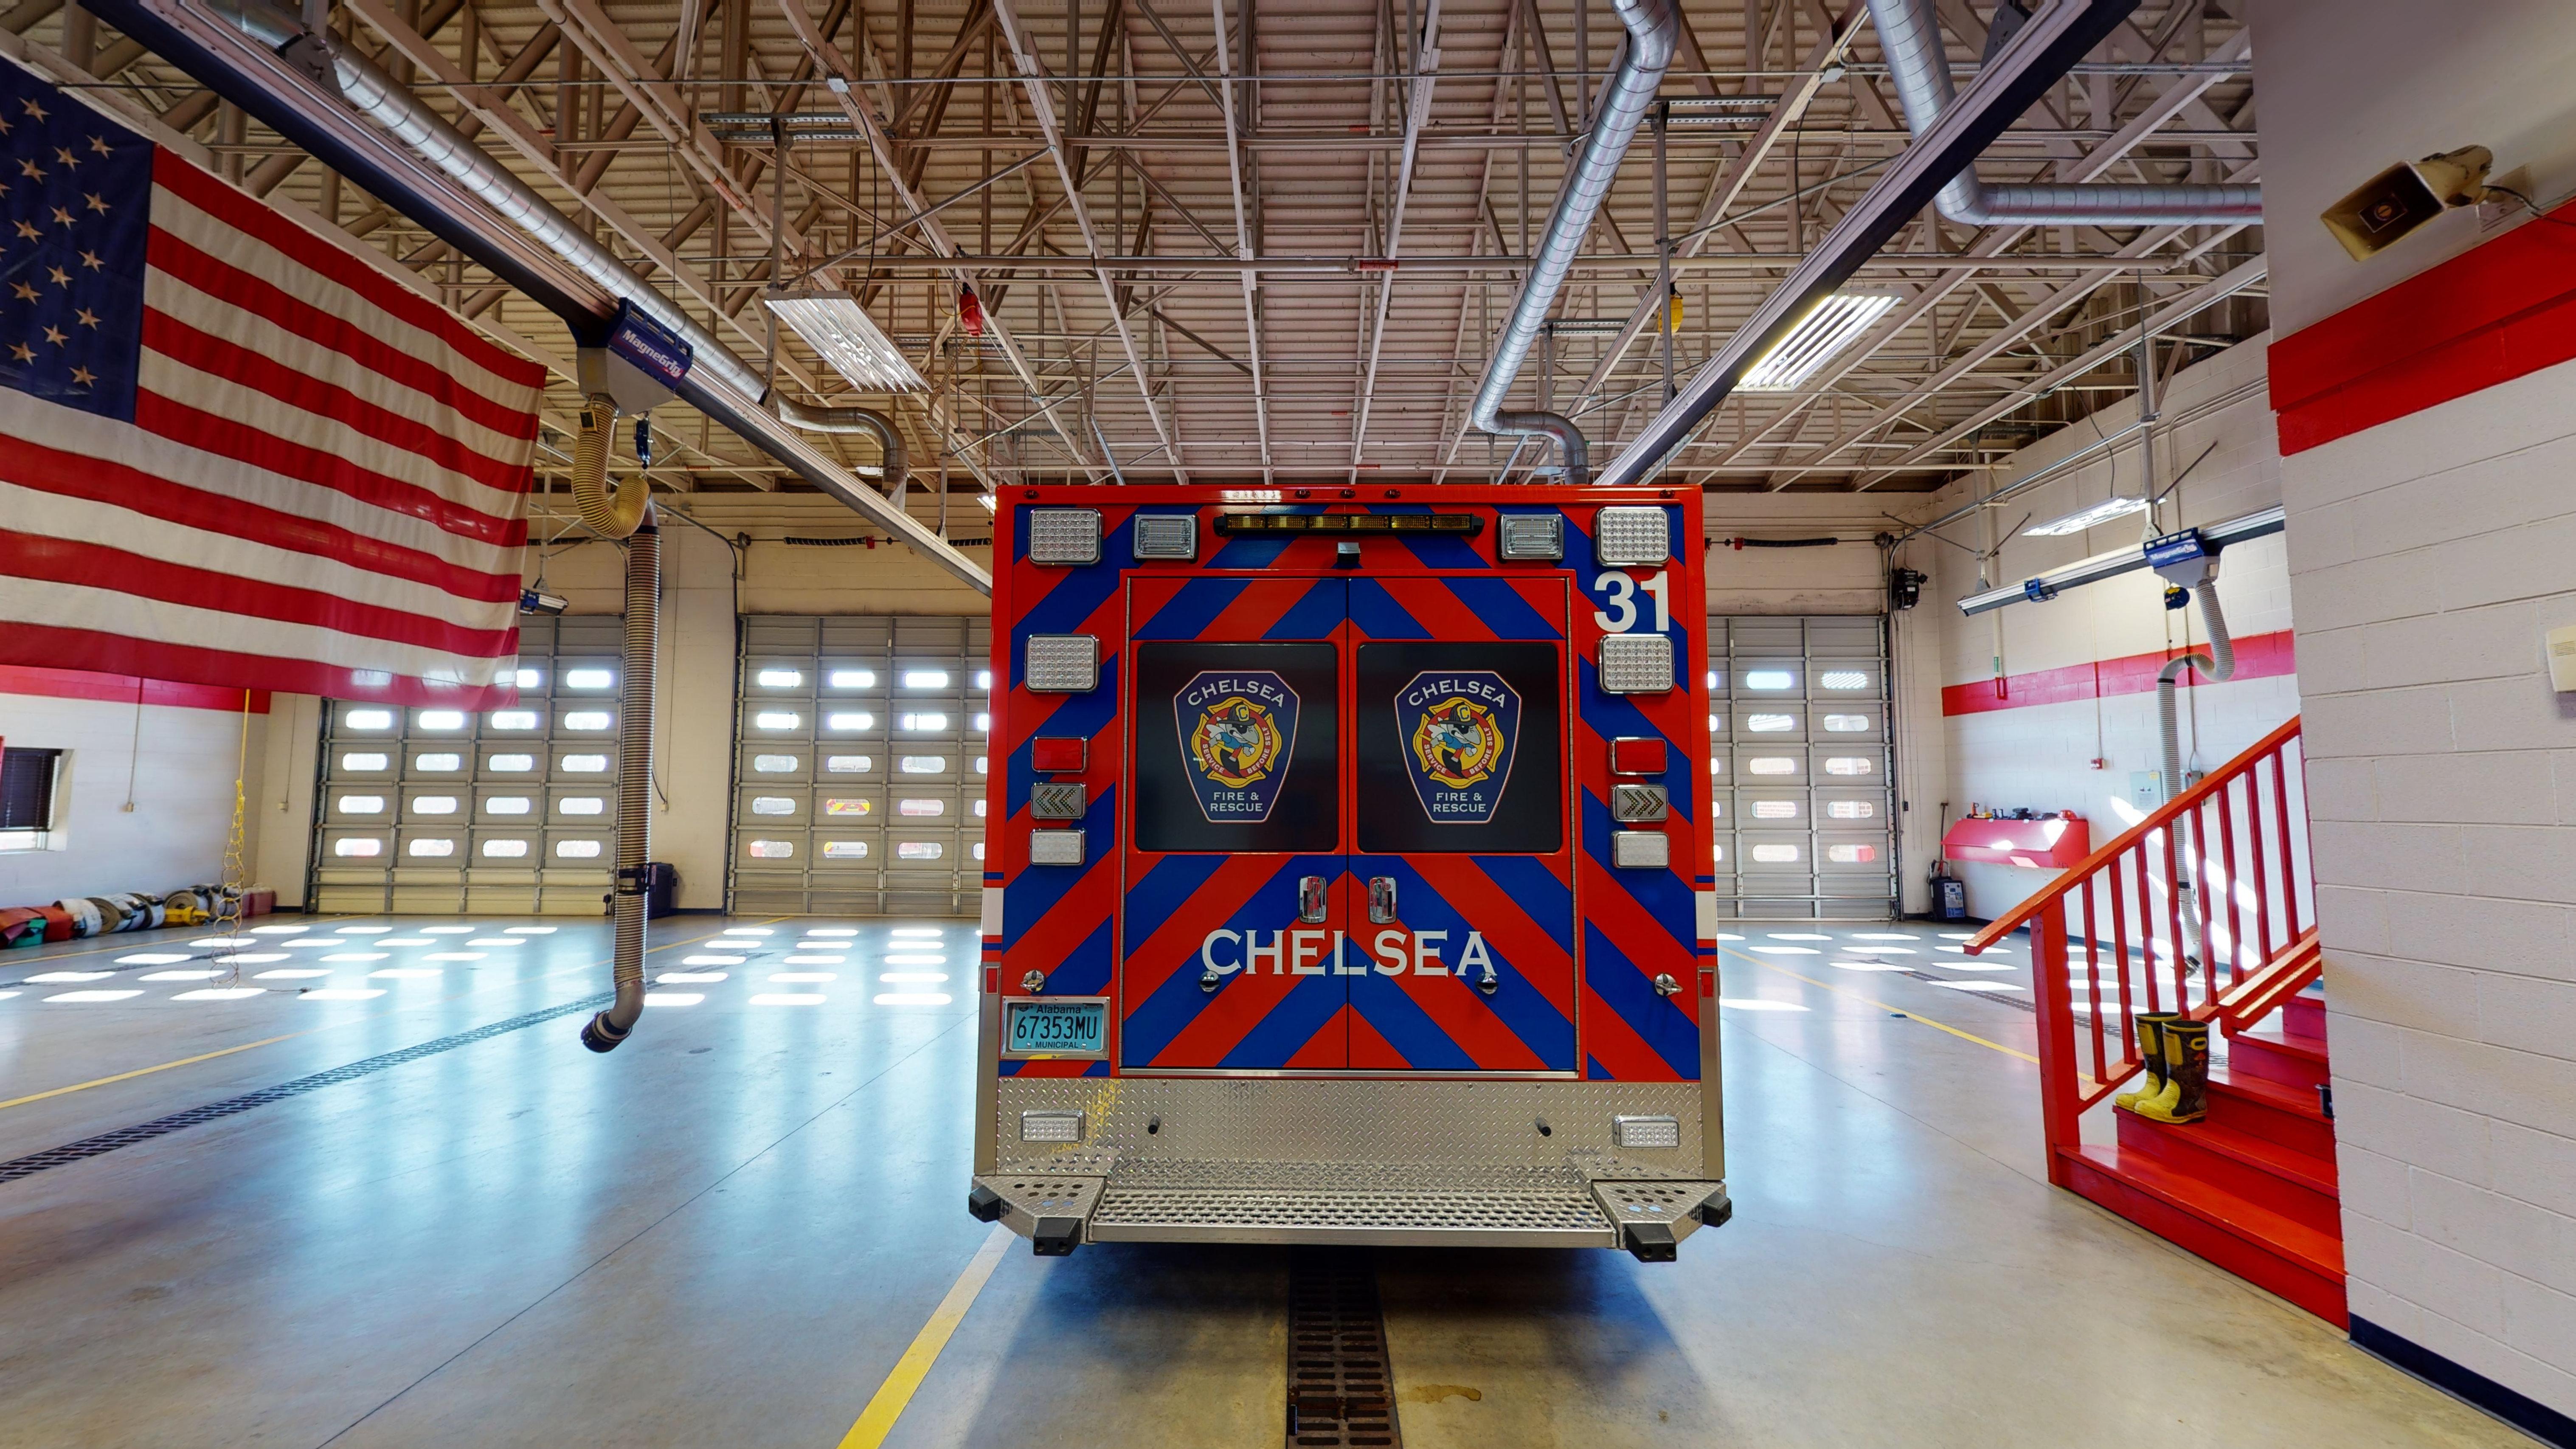 4_Chelsea-Fire-Rescue-Demers-151-06162021_101145